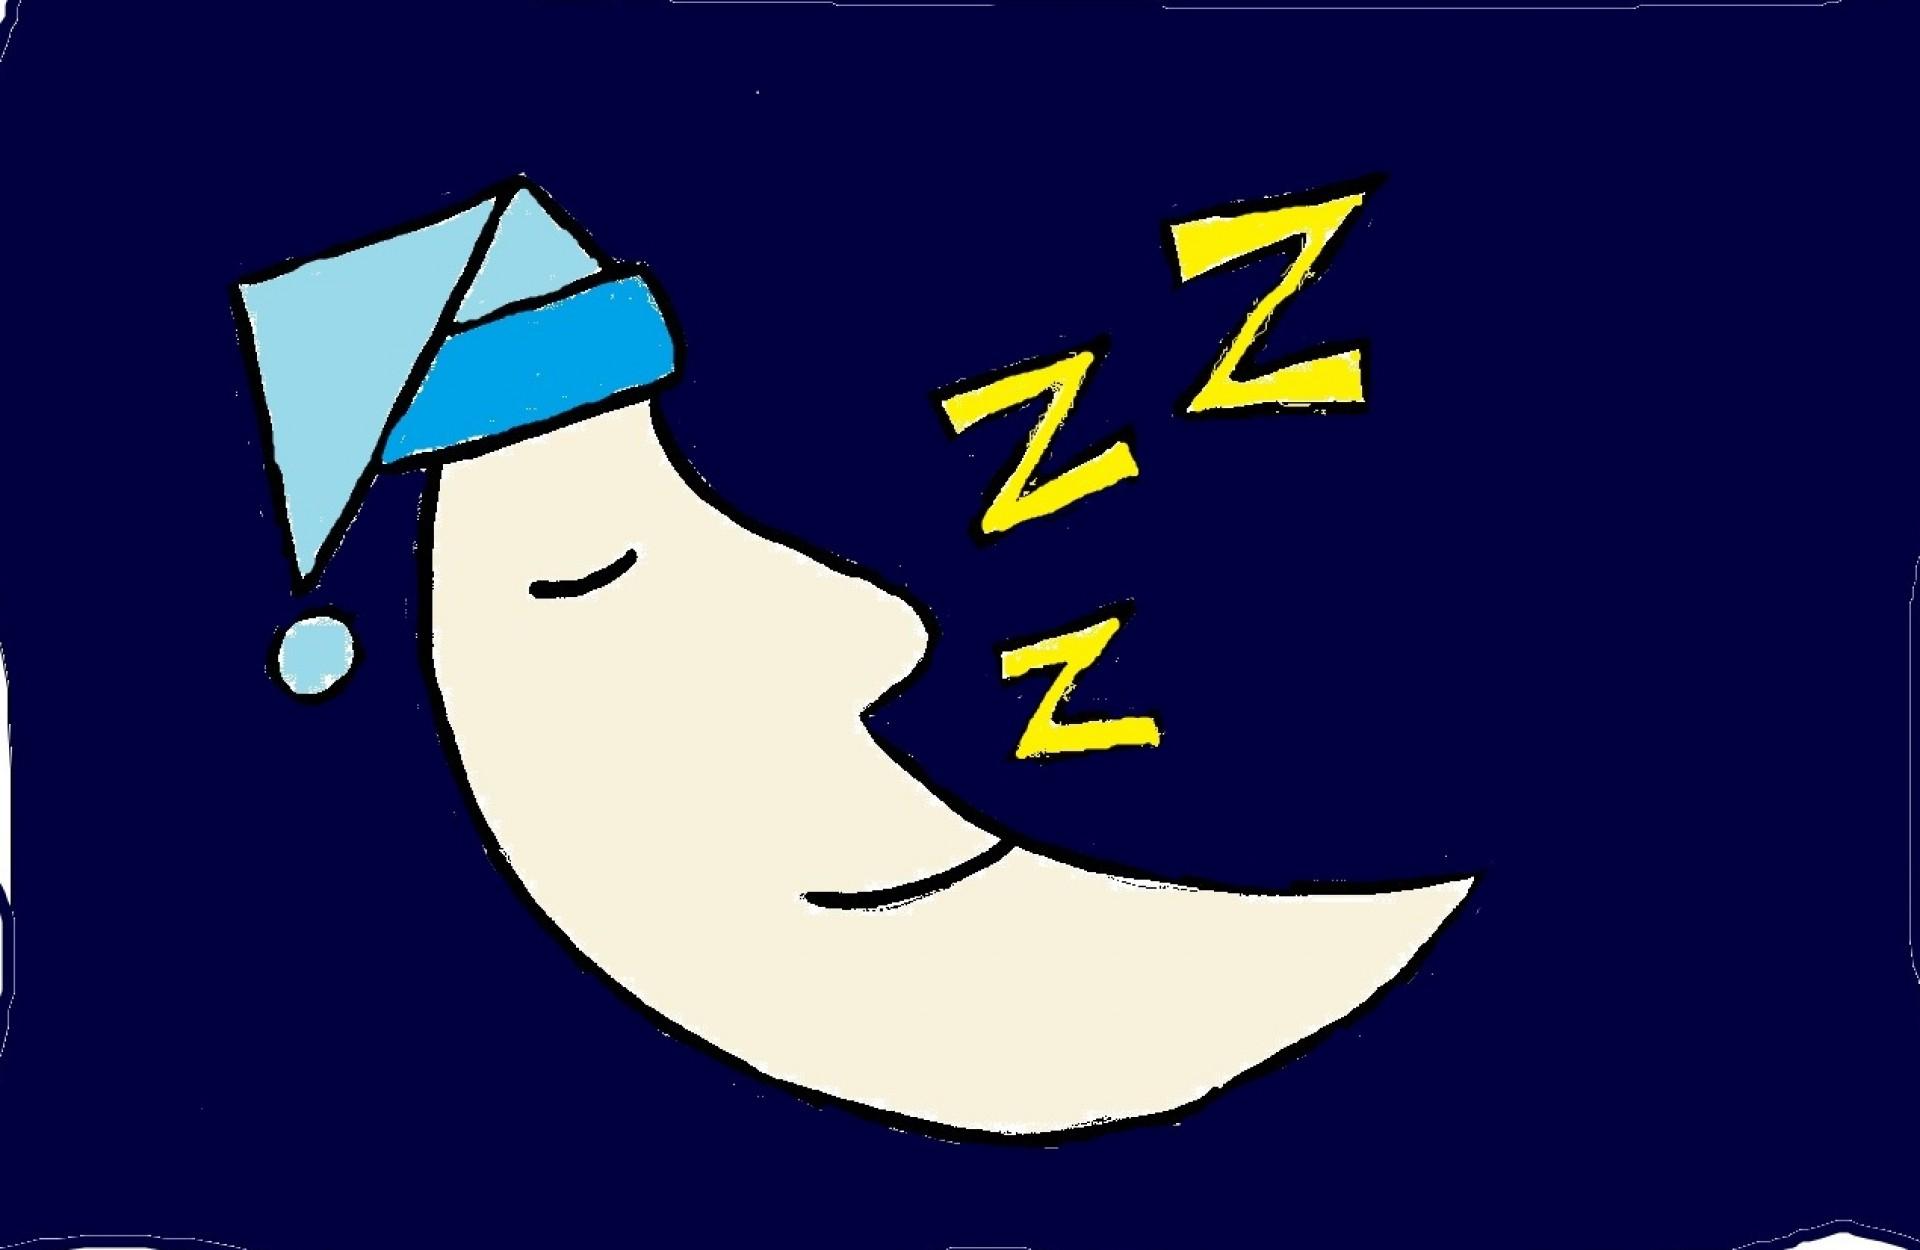 007 Importance Of Sleep Essay Breathtaking Pdf Spm Speech 1920